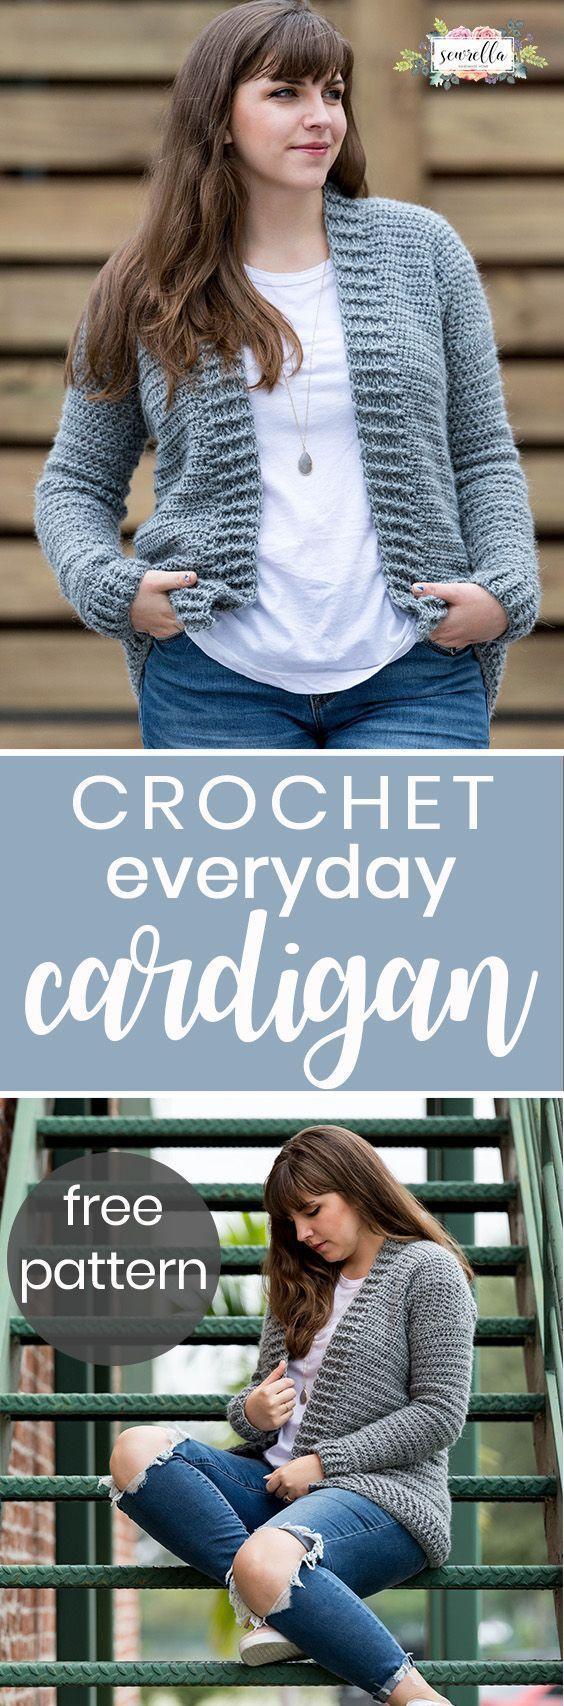 The Everyday Crochet Cardigan:separator:The Everyday Crochet Cardigan